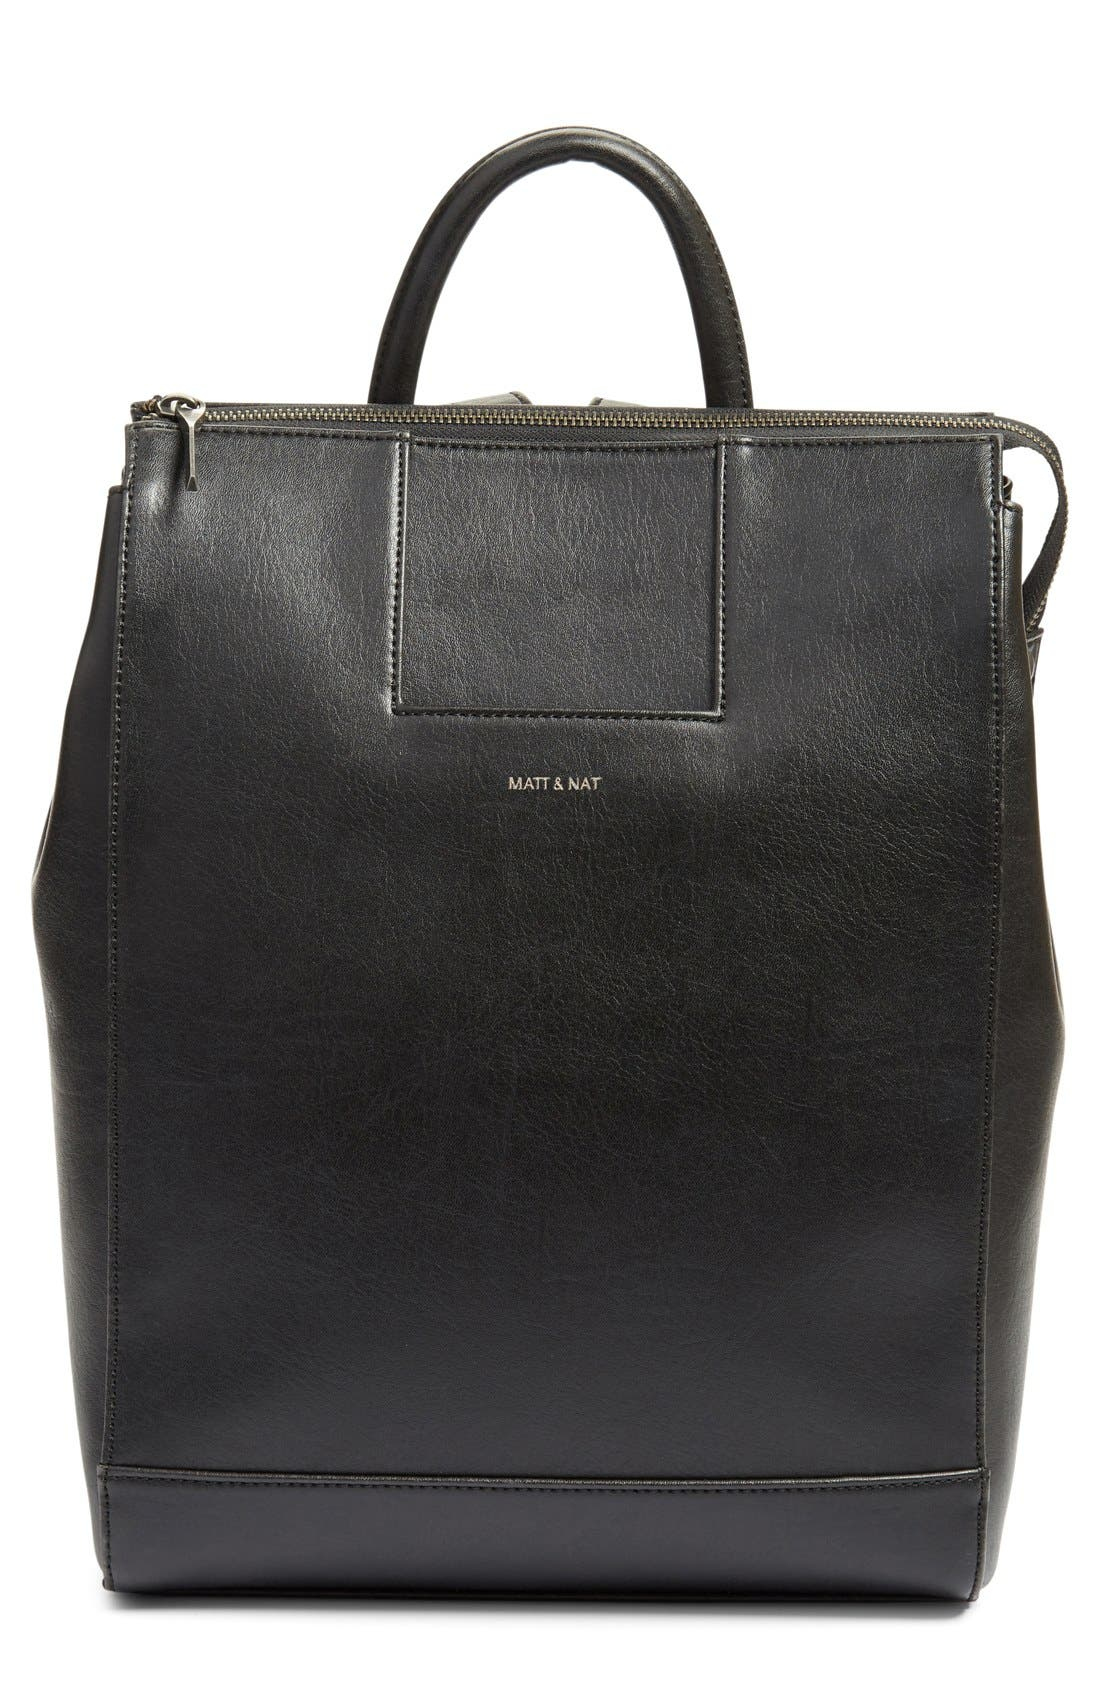 Matt & Nat 'Katherine' Faux Leather Backpack